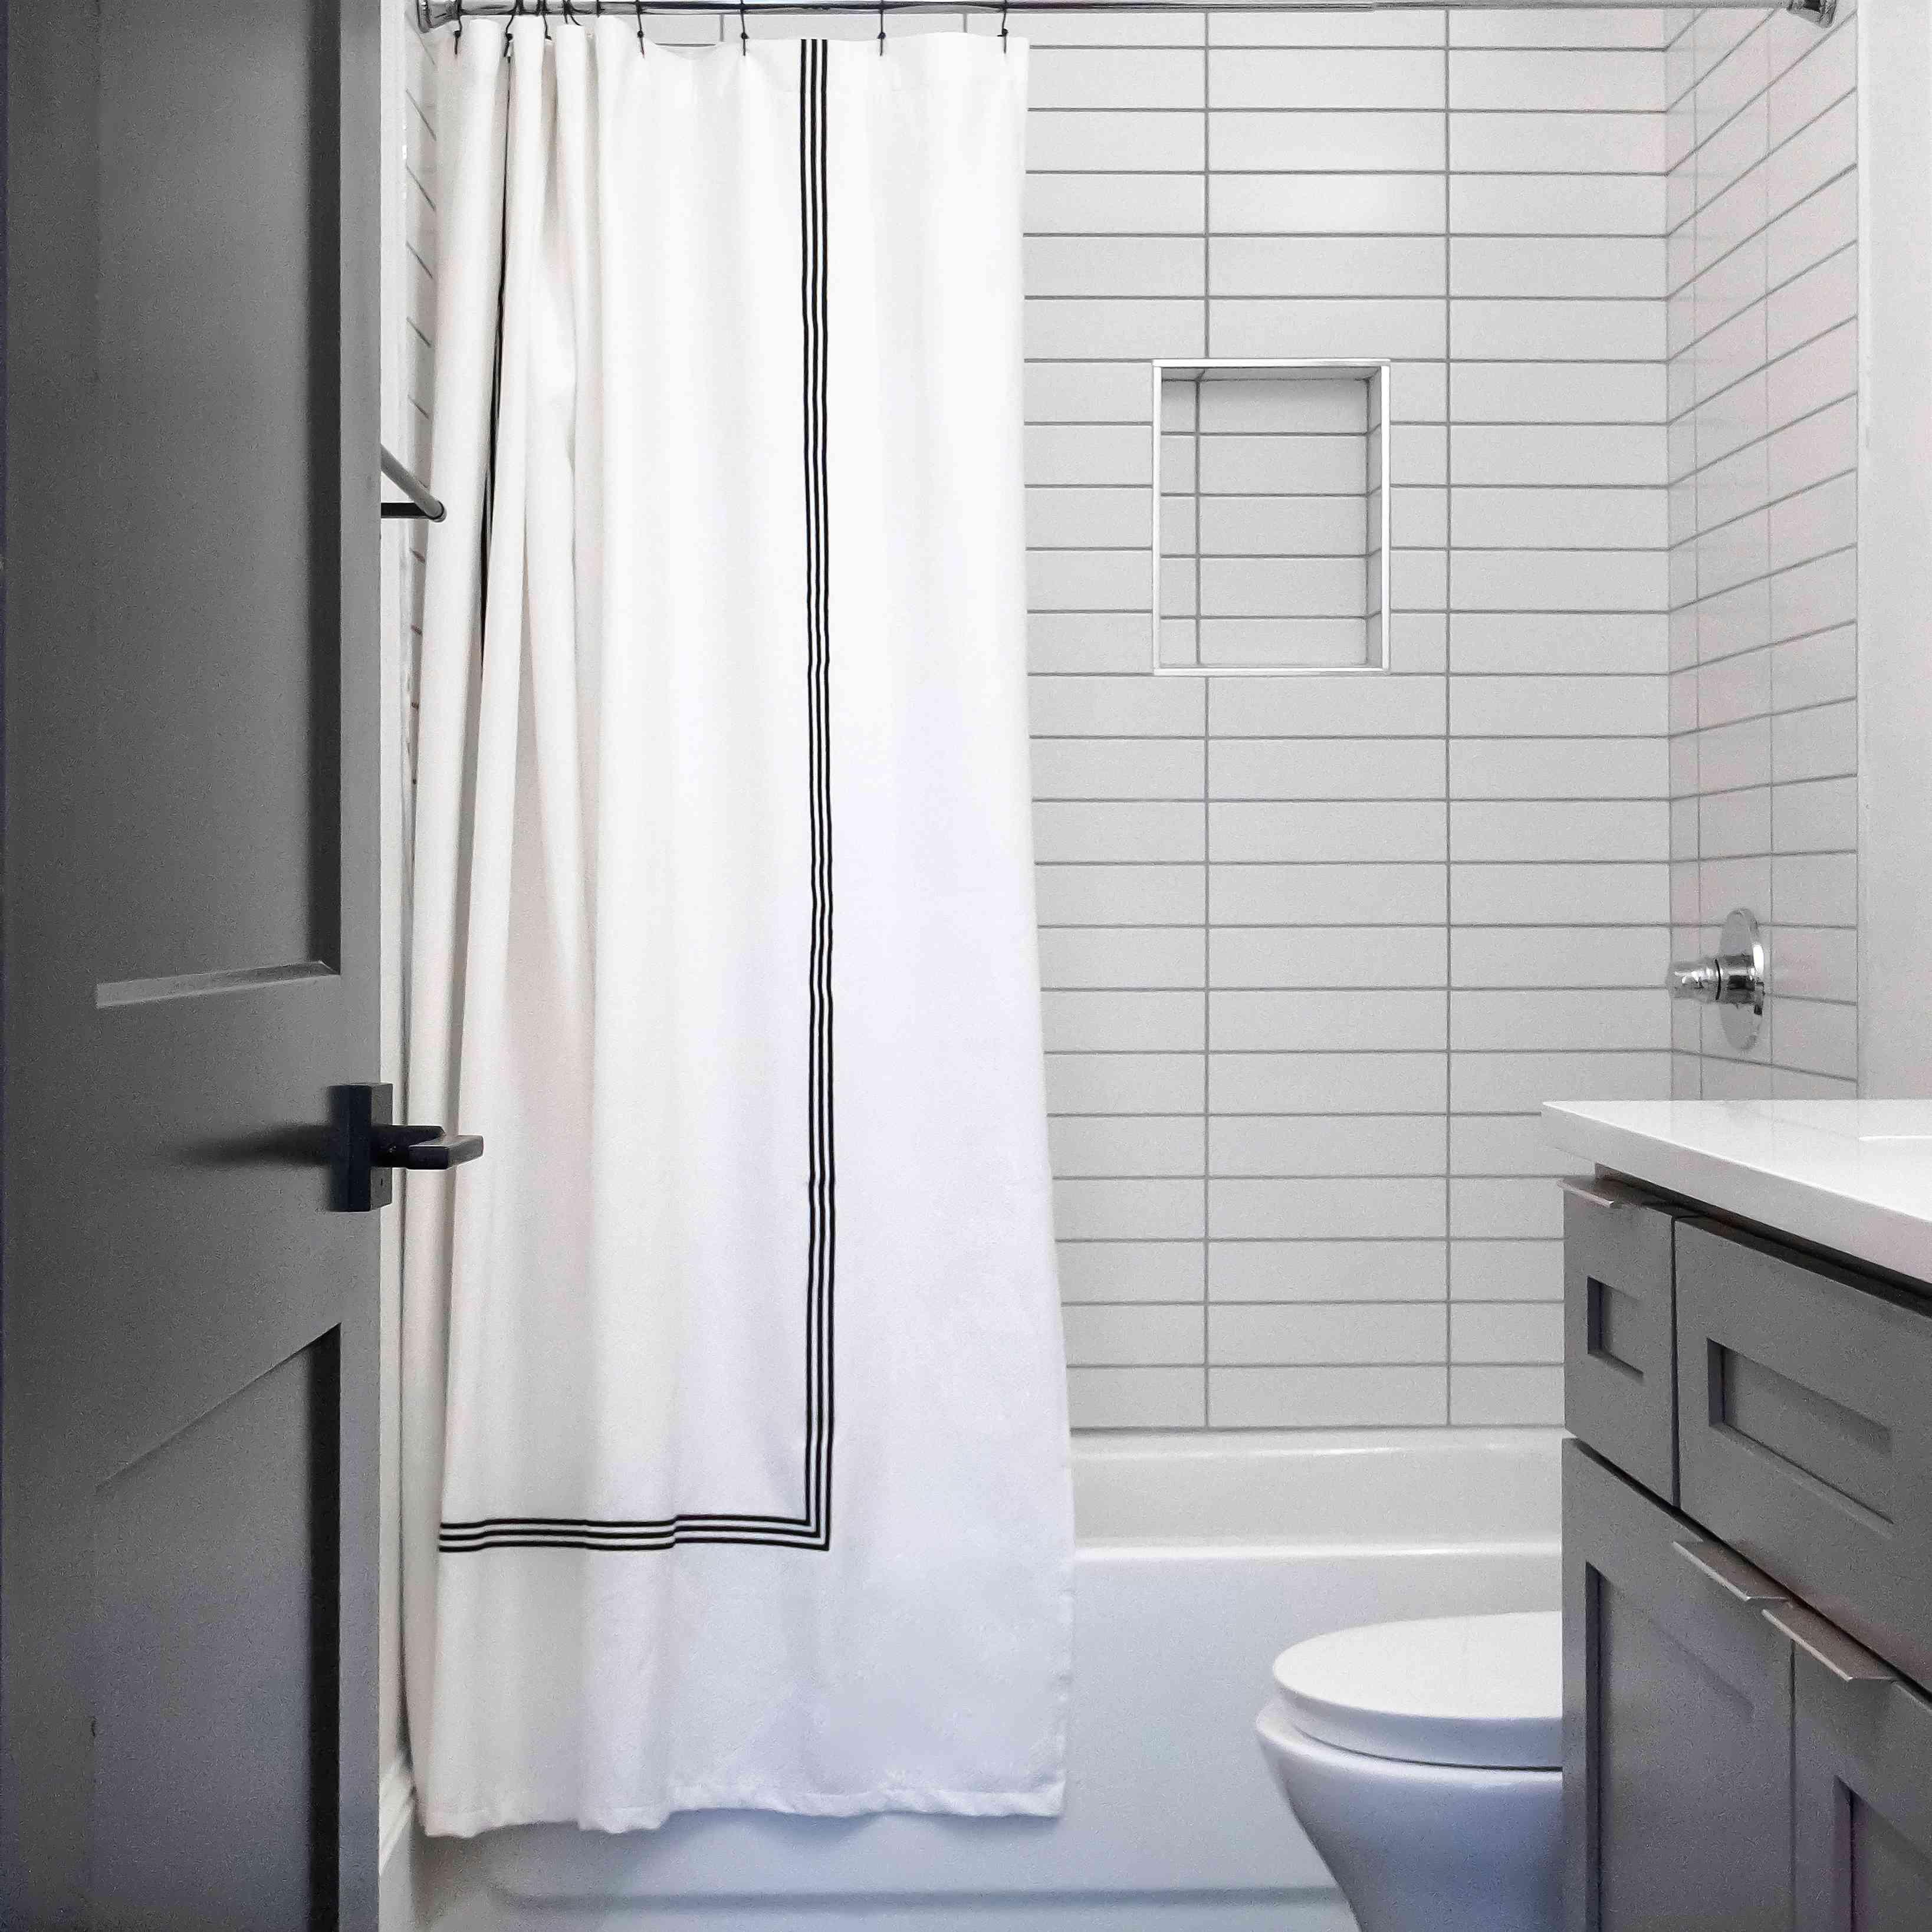 Black tiled bachelor bathroom